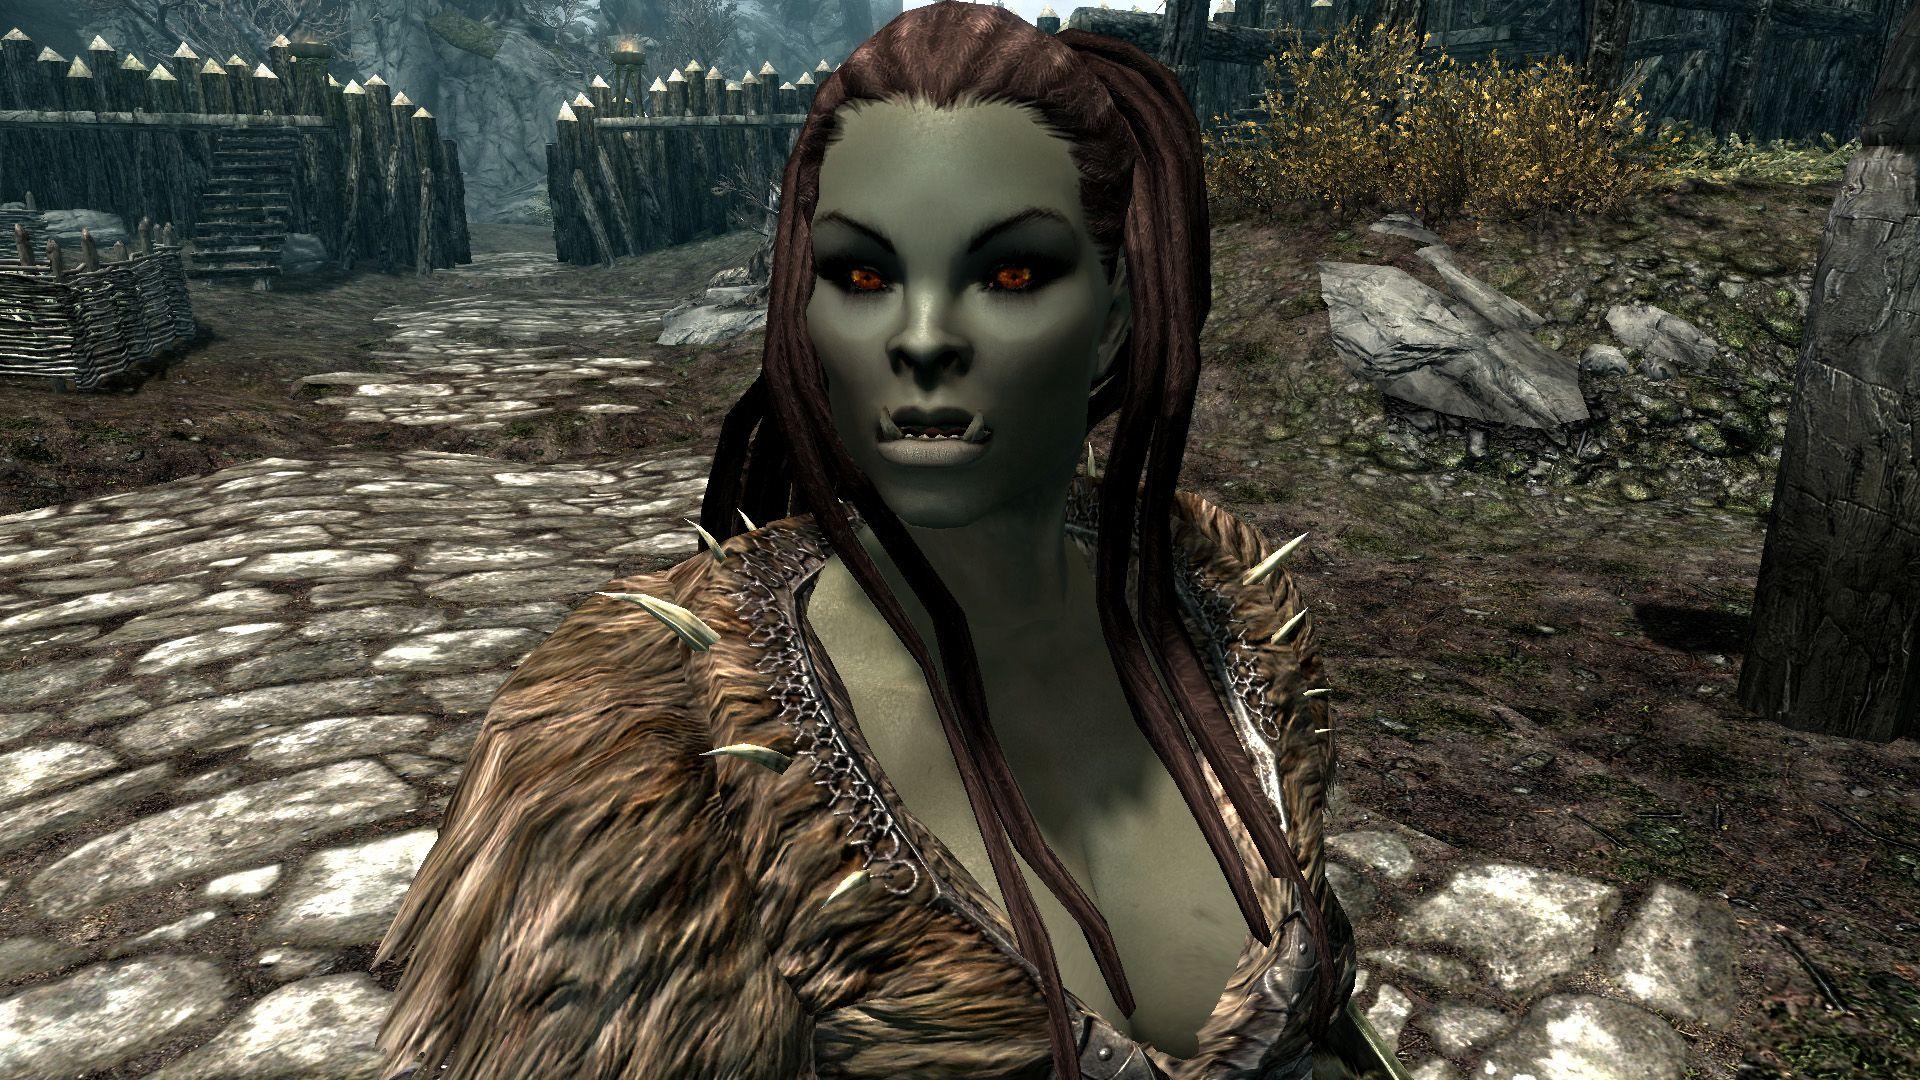 Httpstaticskyrimnexusmodscommodsimages15864 2 1335347698 - Vandrad And Other Half Orcs - Pinterest - Fantasy